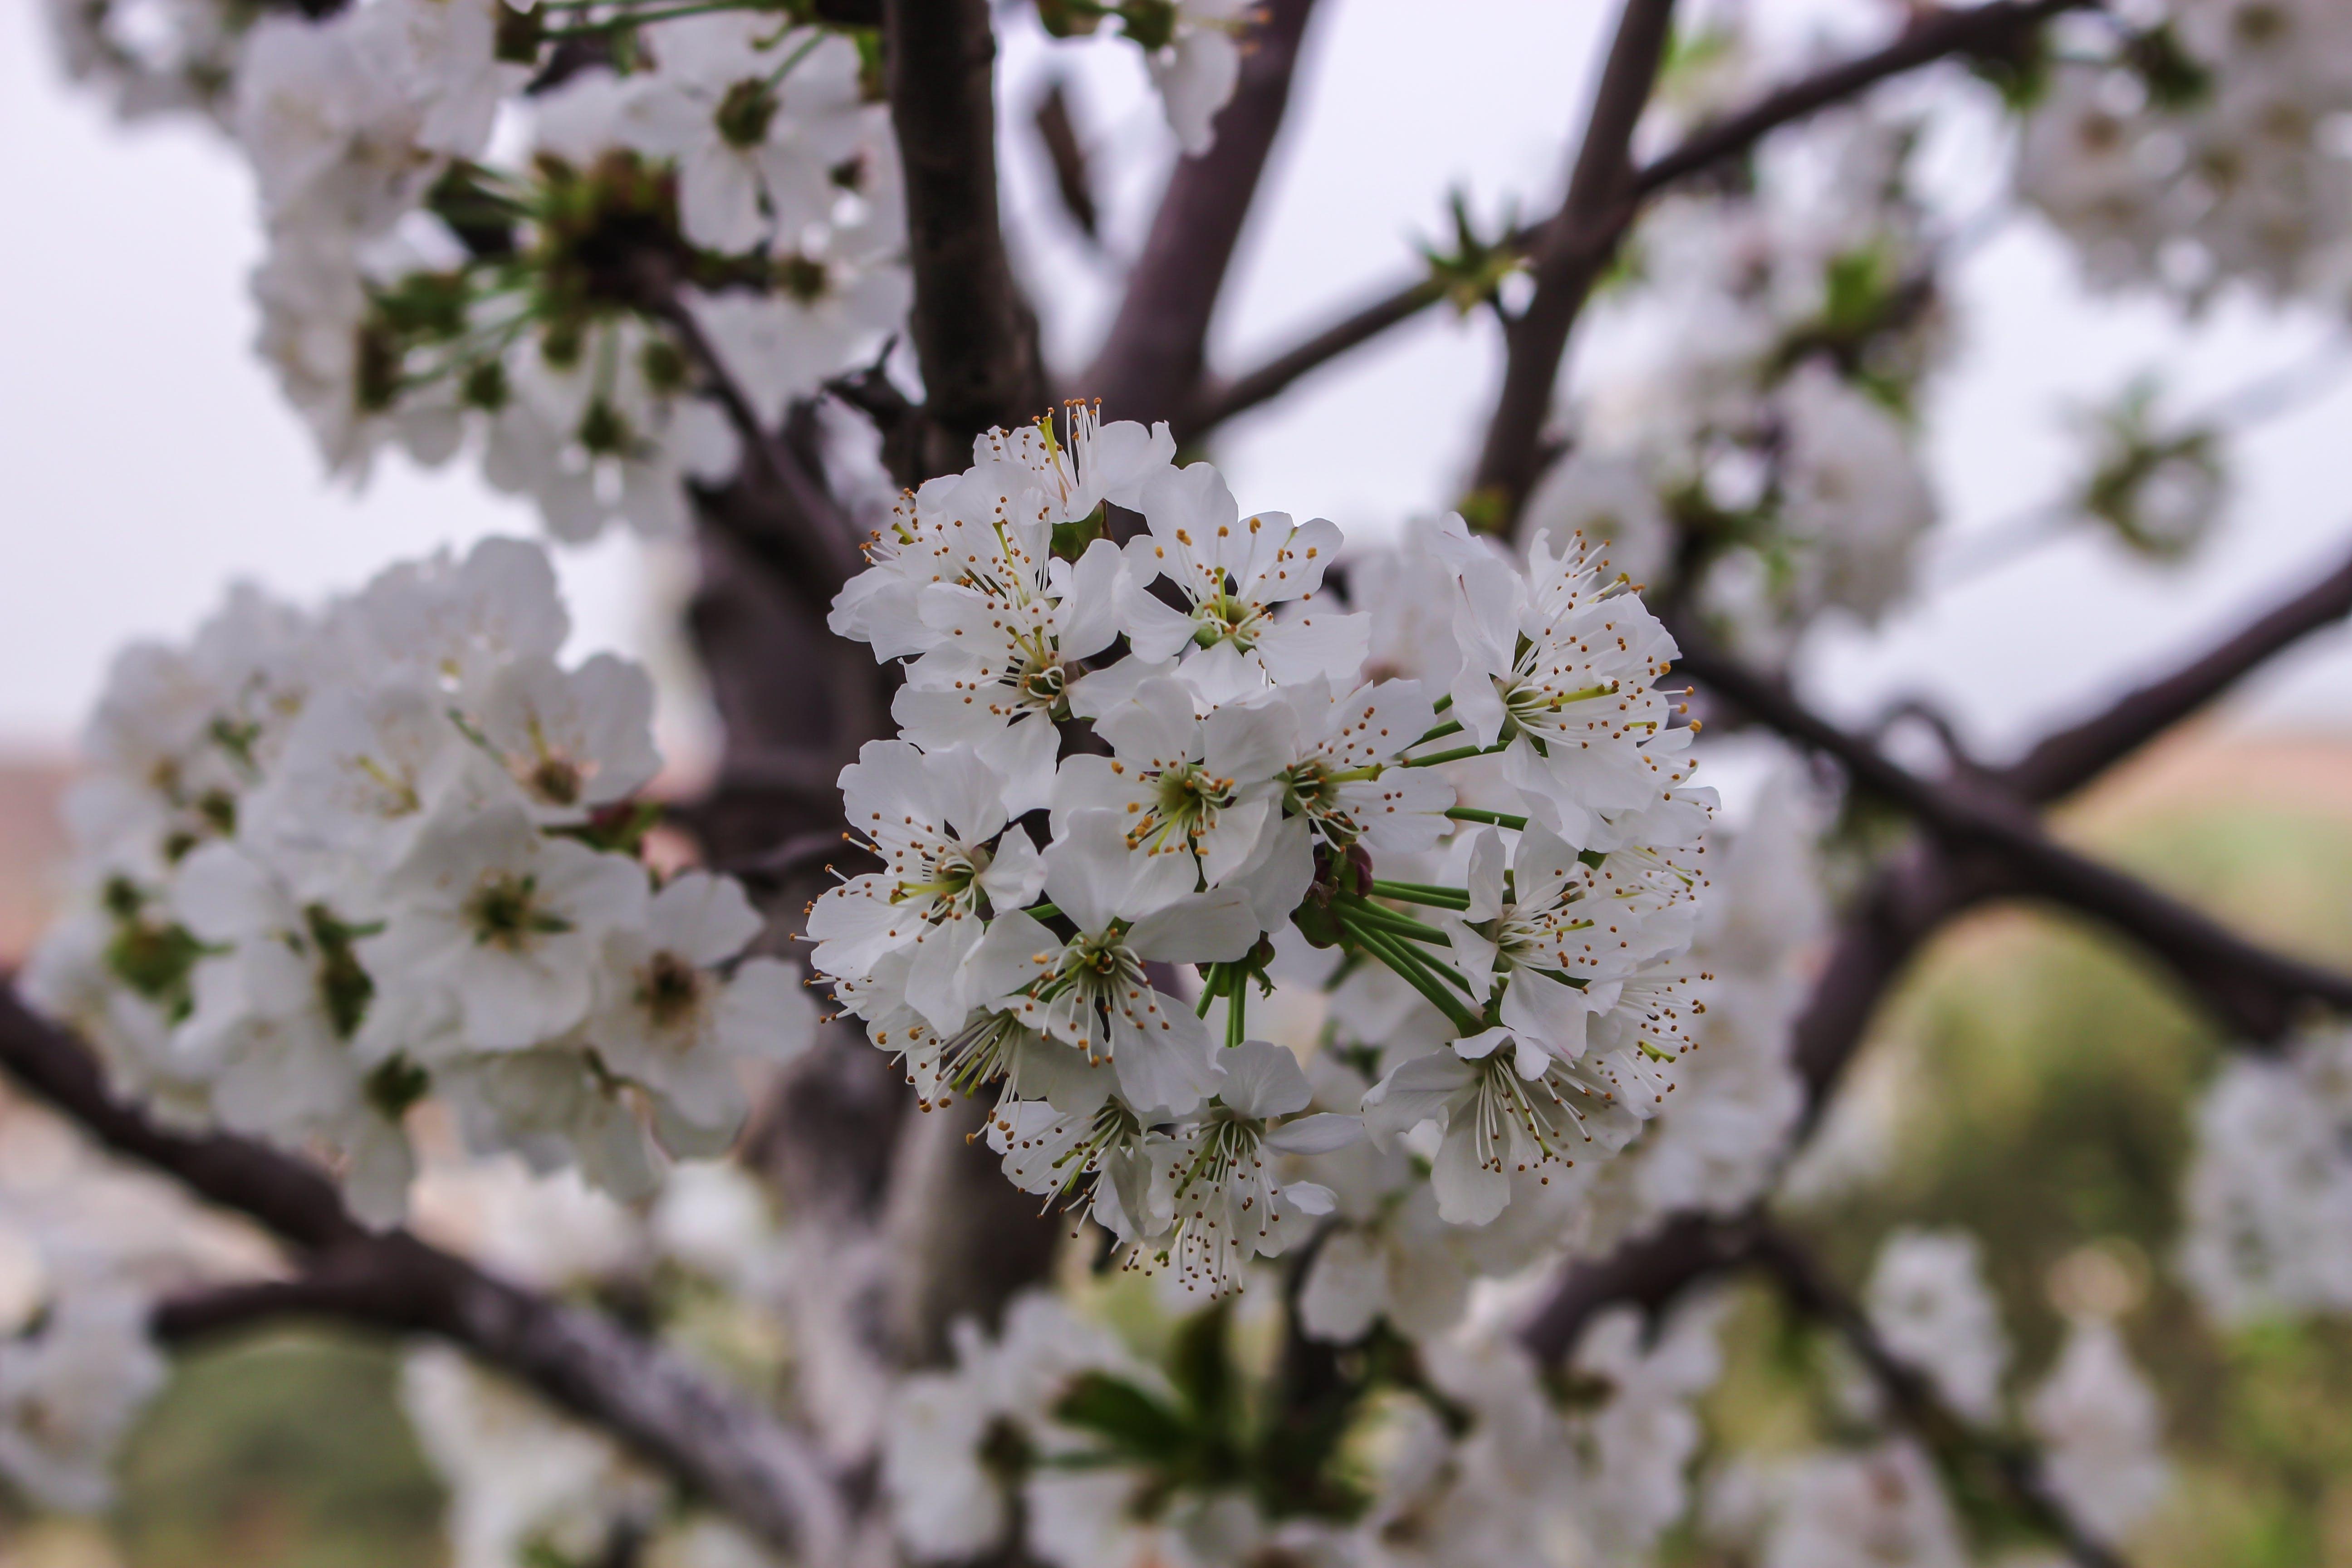 Closeup Photo of White Petaled Flowers